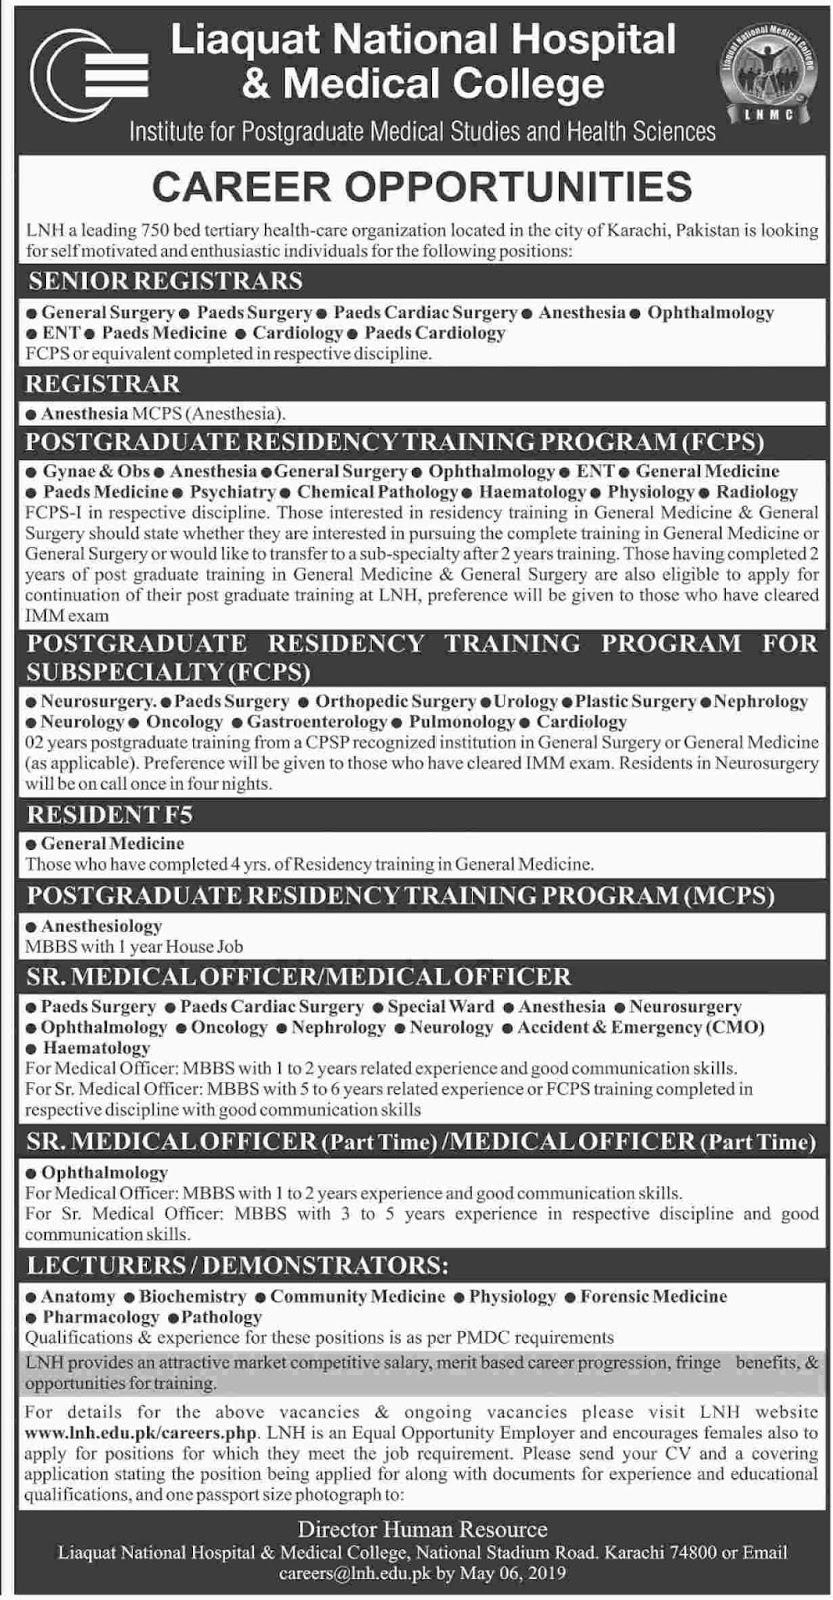 Jobs Vacancies in Liaquat National Hospital And Medical College